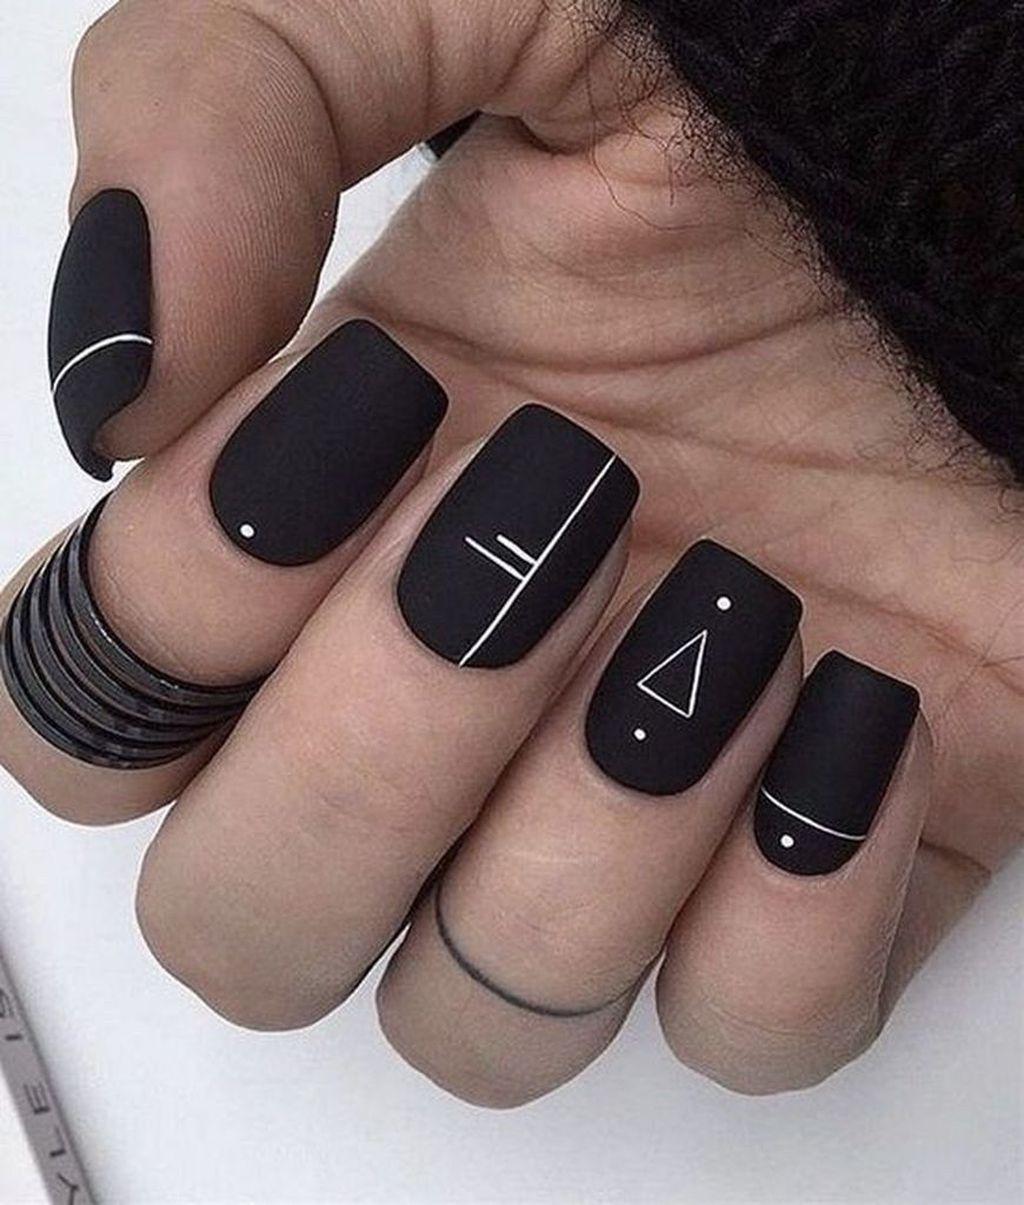 42 Unique Black Nail Art Designs Ideas That You Must Try Square Acrylic Nails Matte Nails Design Solid Color Nails